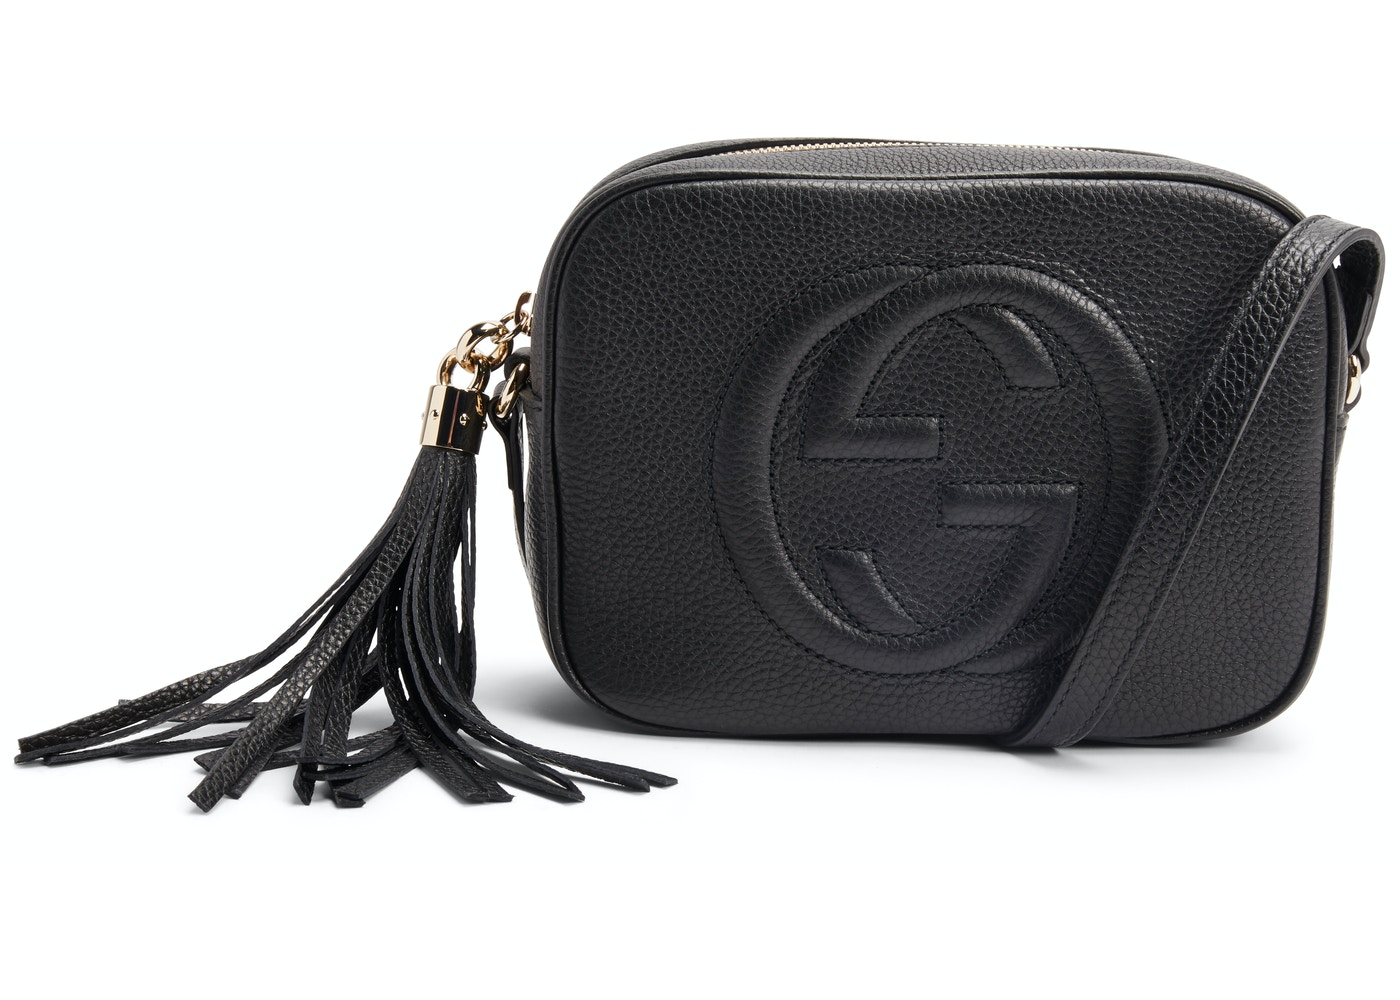 762d8807 Gucci Soho Disco Leather Small Black